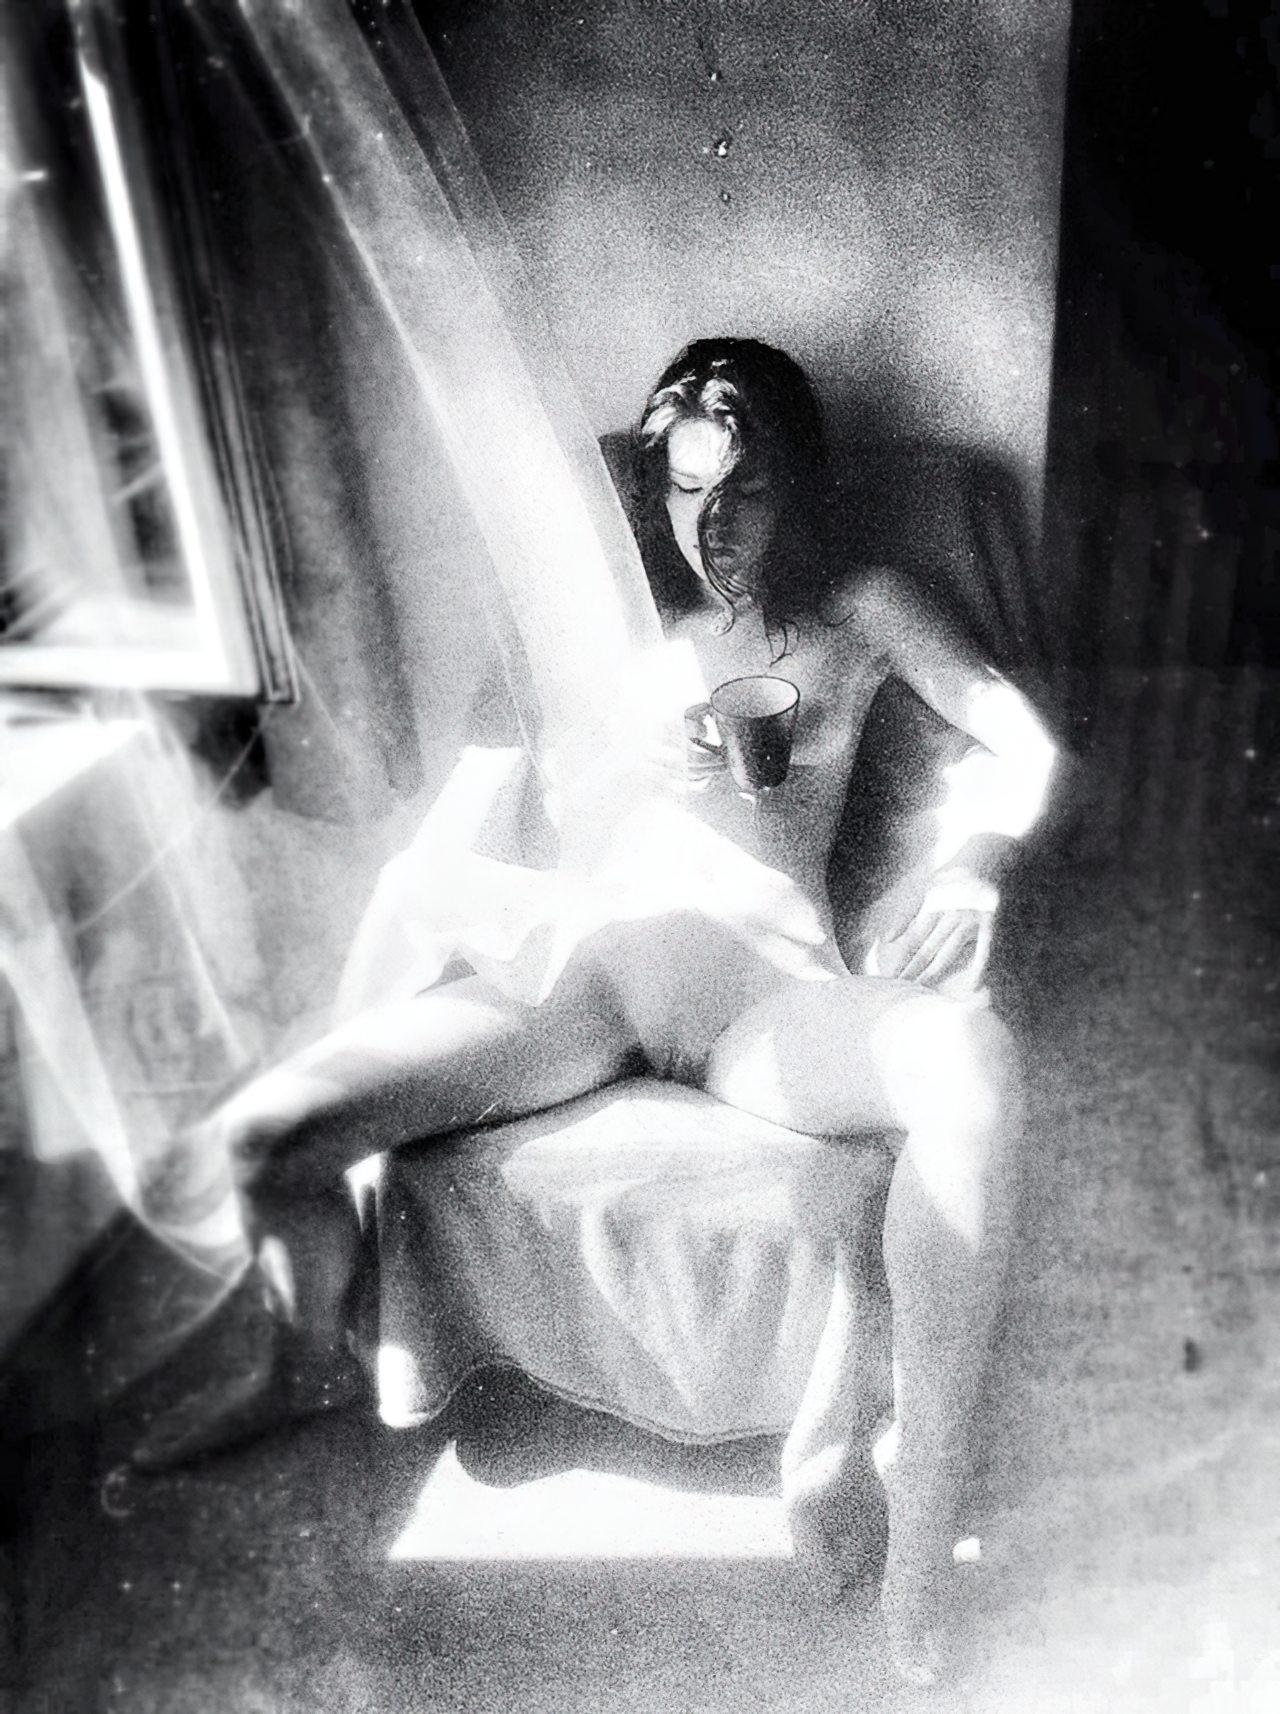 Mulheres Despidas (10)